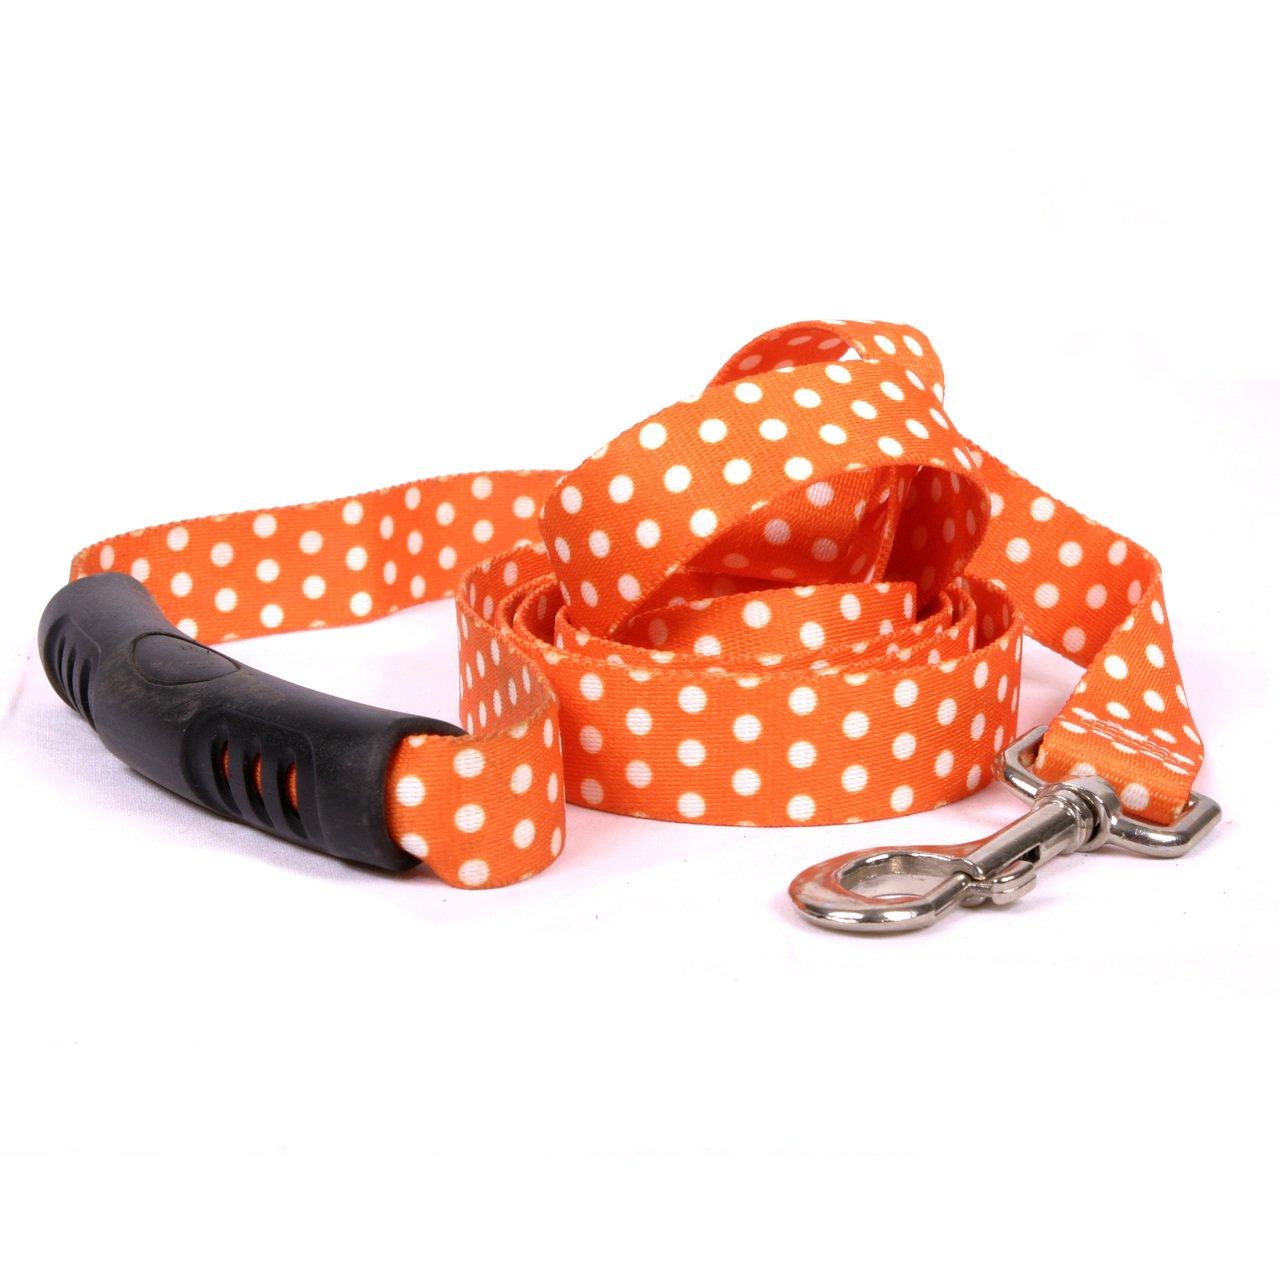 Yellow Dog Design Orange Polka Dot EZ-Grip Dog Leash with Comfort Handle, Large-1'' Wide and 5' (60'') Long